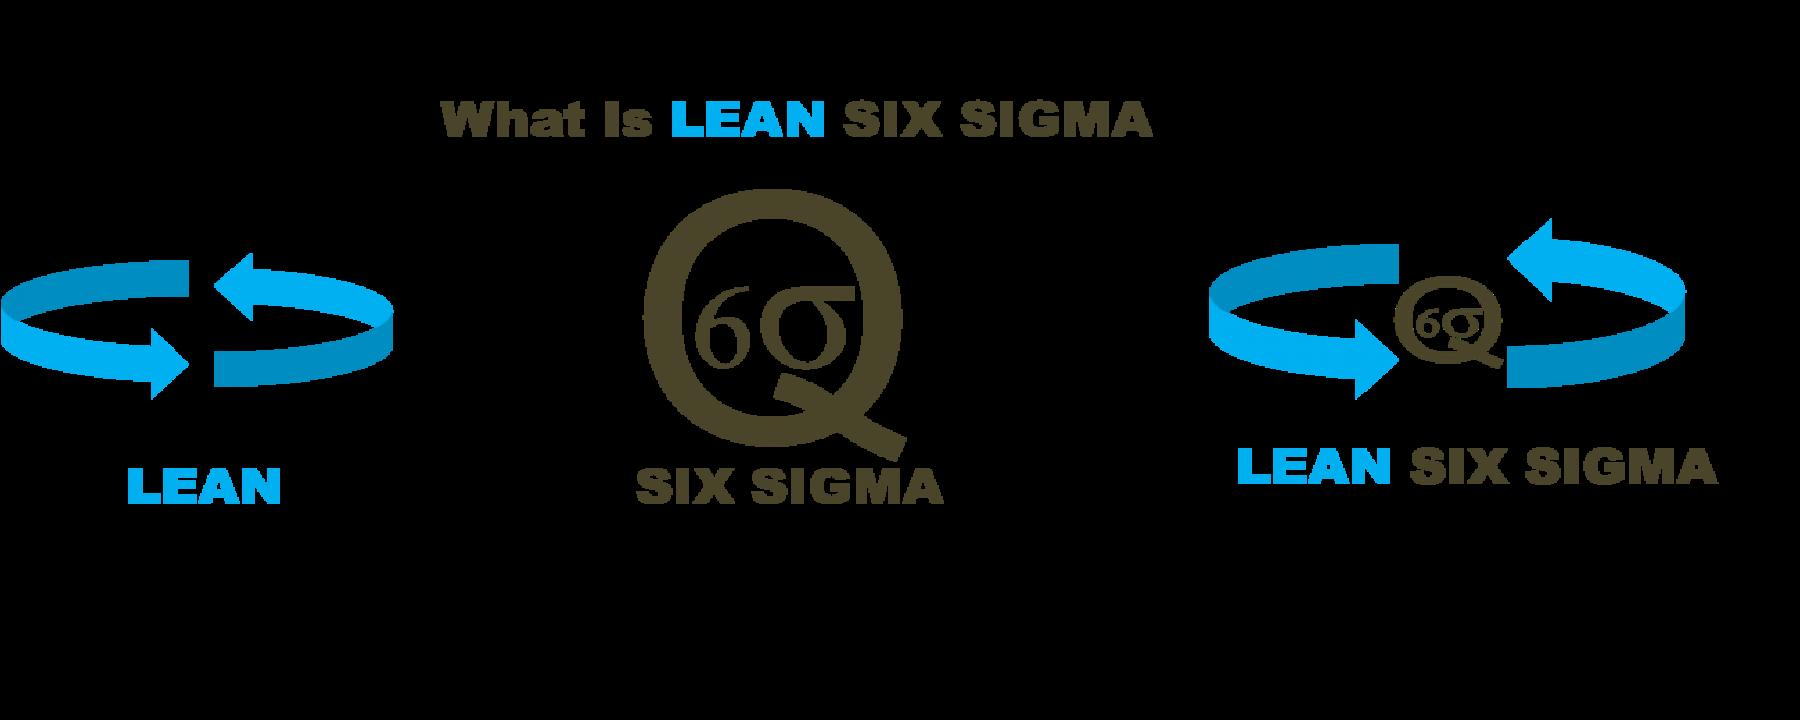 Lean Six Sigma Malaysia What Are The Methods Involved In The Six Sigma Methodology Lean Six Sigma Lean Sigma Sigma